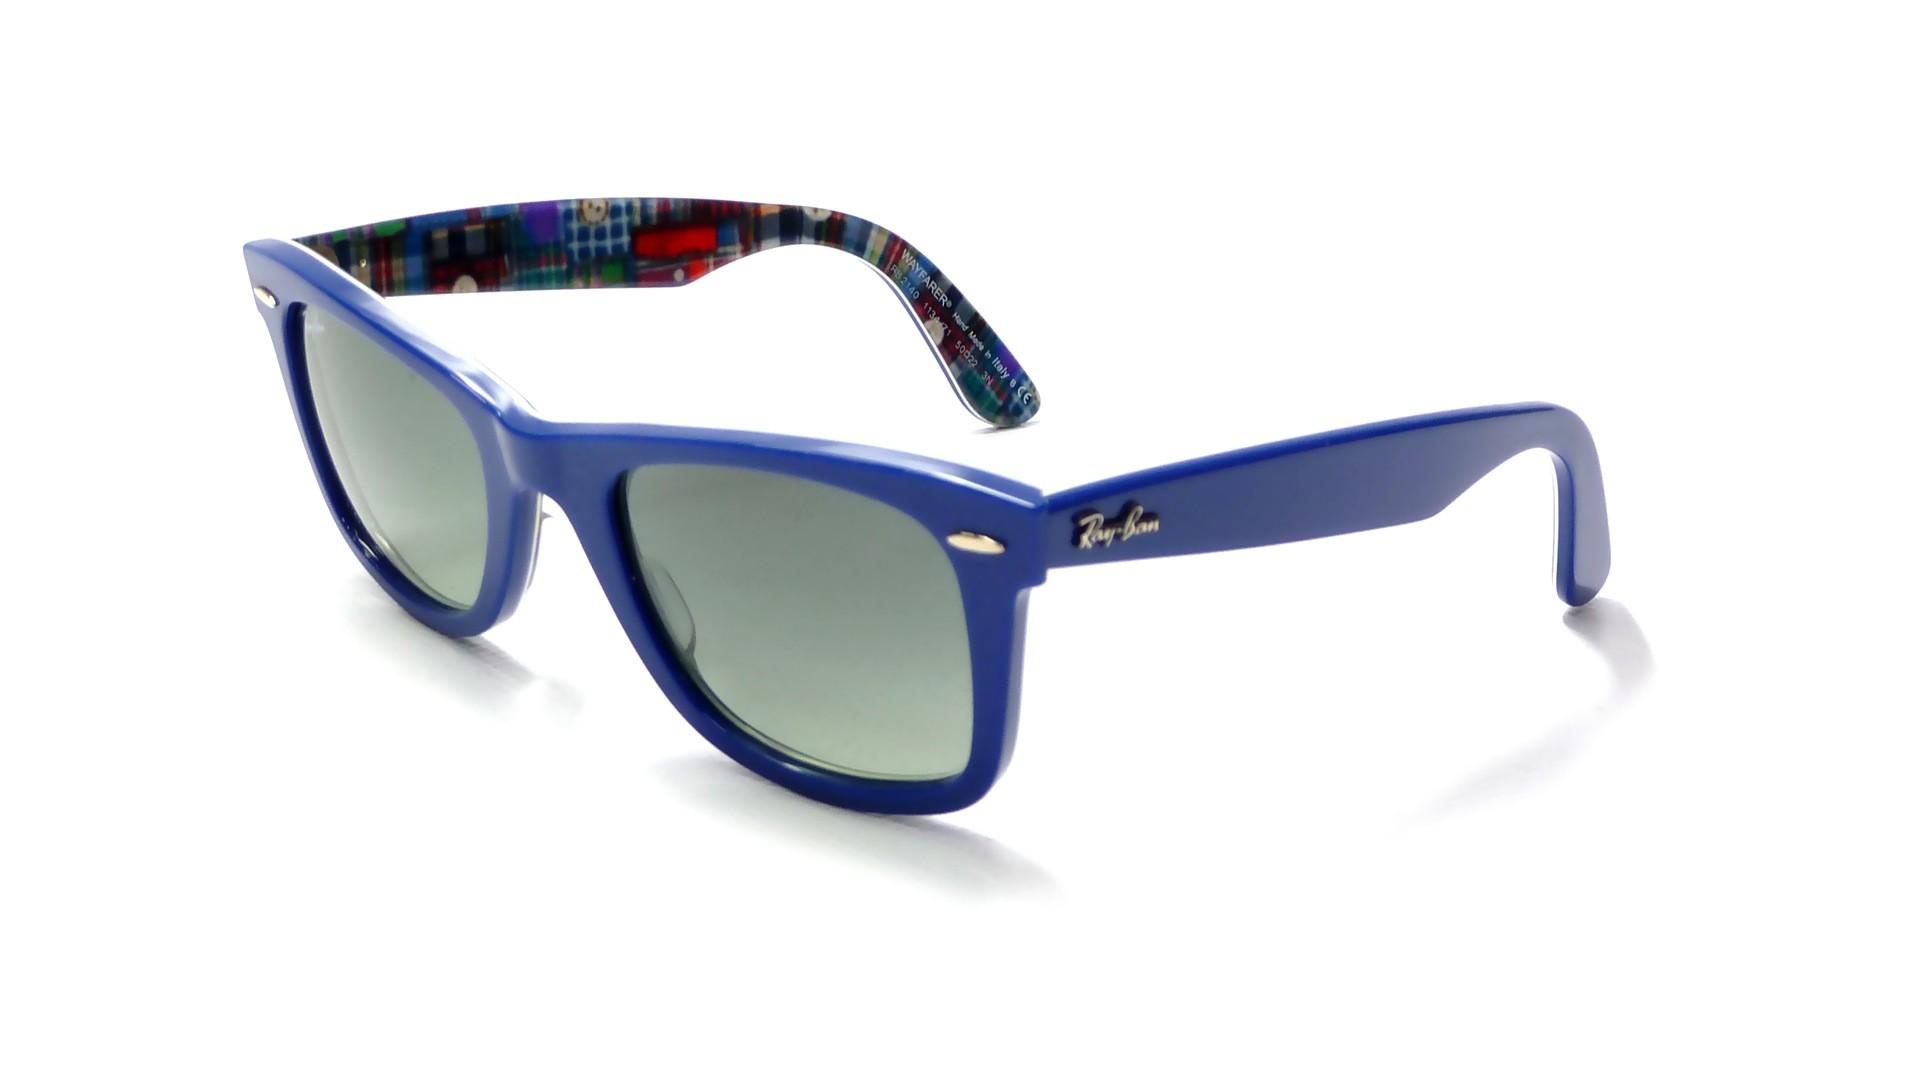 Lunette Ray Ban Clubmaster Bleu